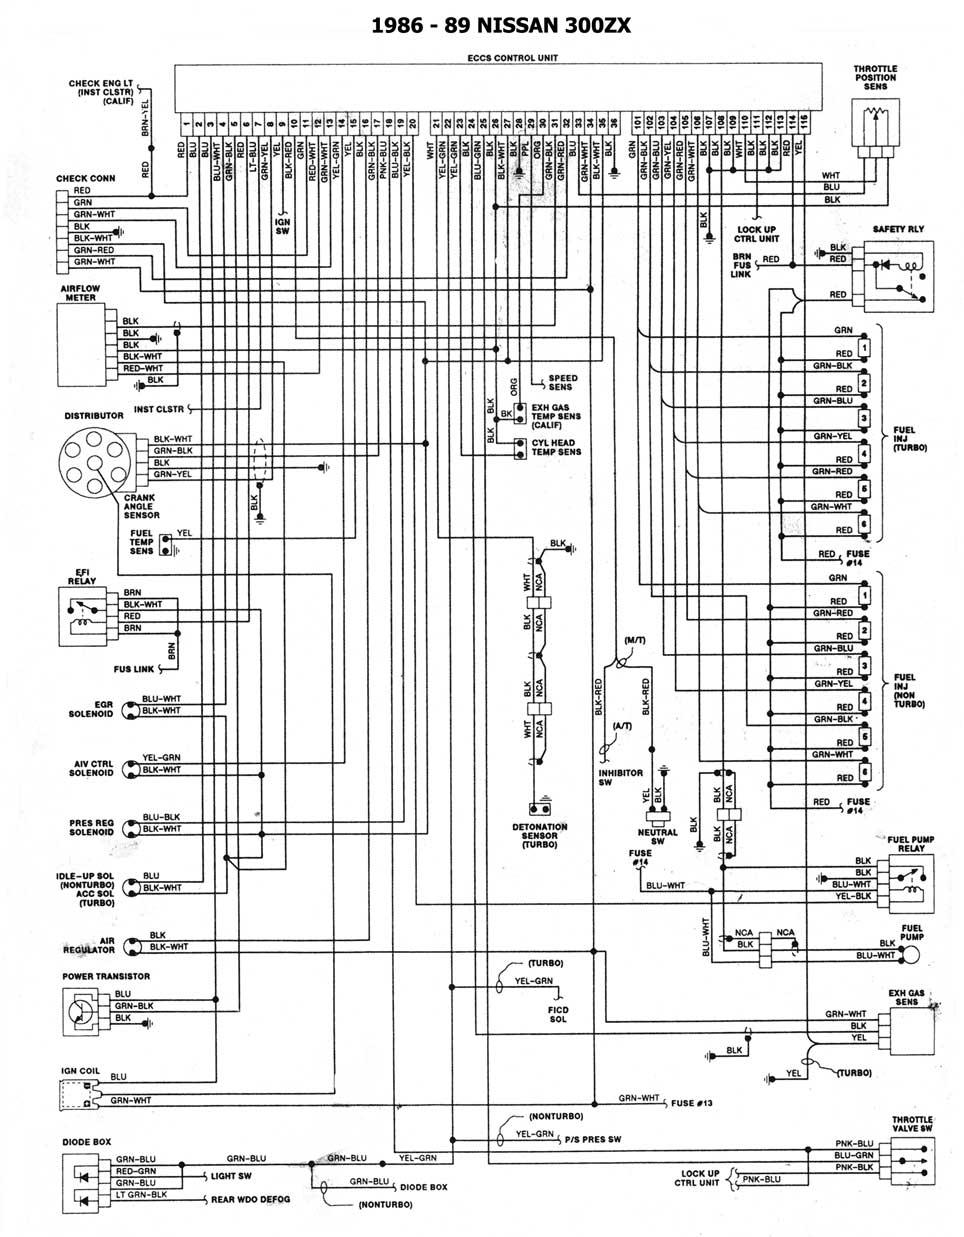 1986 Nissan Sentra Wiring Diagram Get Free Image About ... on nissan d21 tires, nissan d21 transmission, honda accord wiring diagram, nissan d21 brake system, nissan d21 parts catalog, lexus rx300 wiring diagram, nissan d21 rear suspension, nissan d21 dimensions, audi a4 wiring diagram, nissan d21 fan belt, mitsubishi l200 wiring diagram, mercedes sprinter wiring diagram, nissan d21 accessories, toyota celica wiring diagram, mazda 3 wiring diagram, mazda 6 wiring diagram, nissan d21 ignition coil, nissan d21 engine, honda civic wiring diagram, mitsubishi lancer wiring diagram,